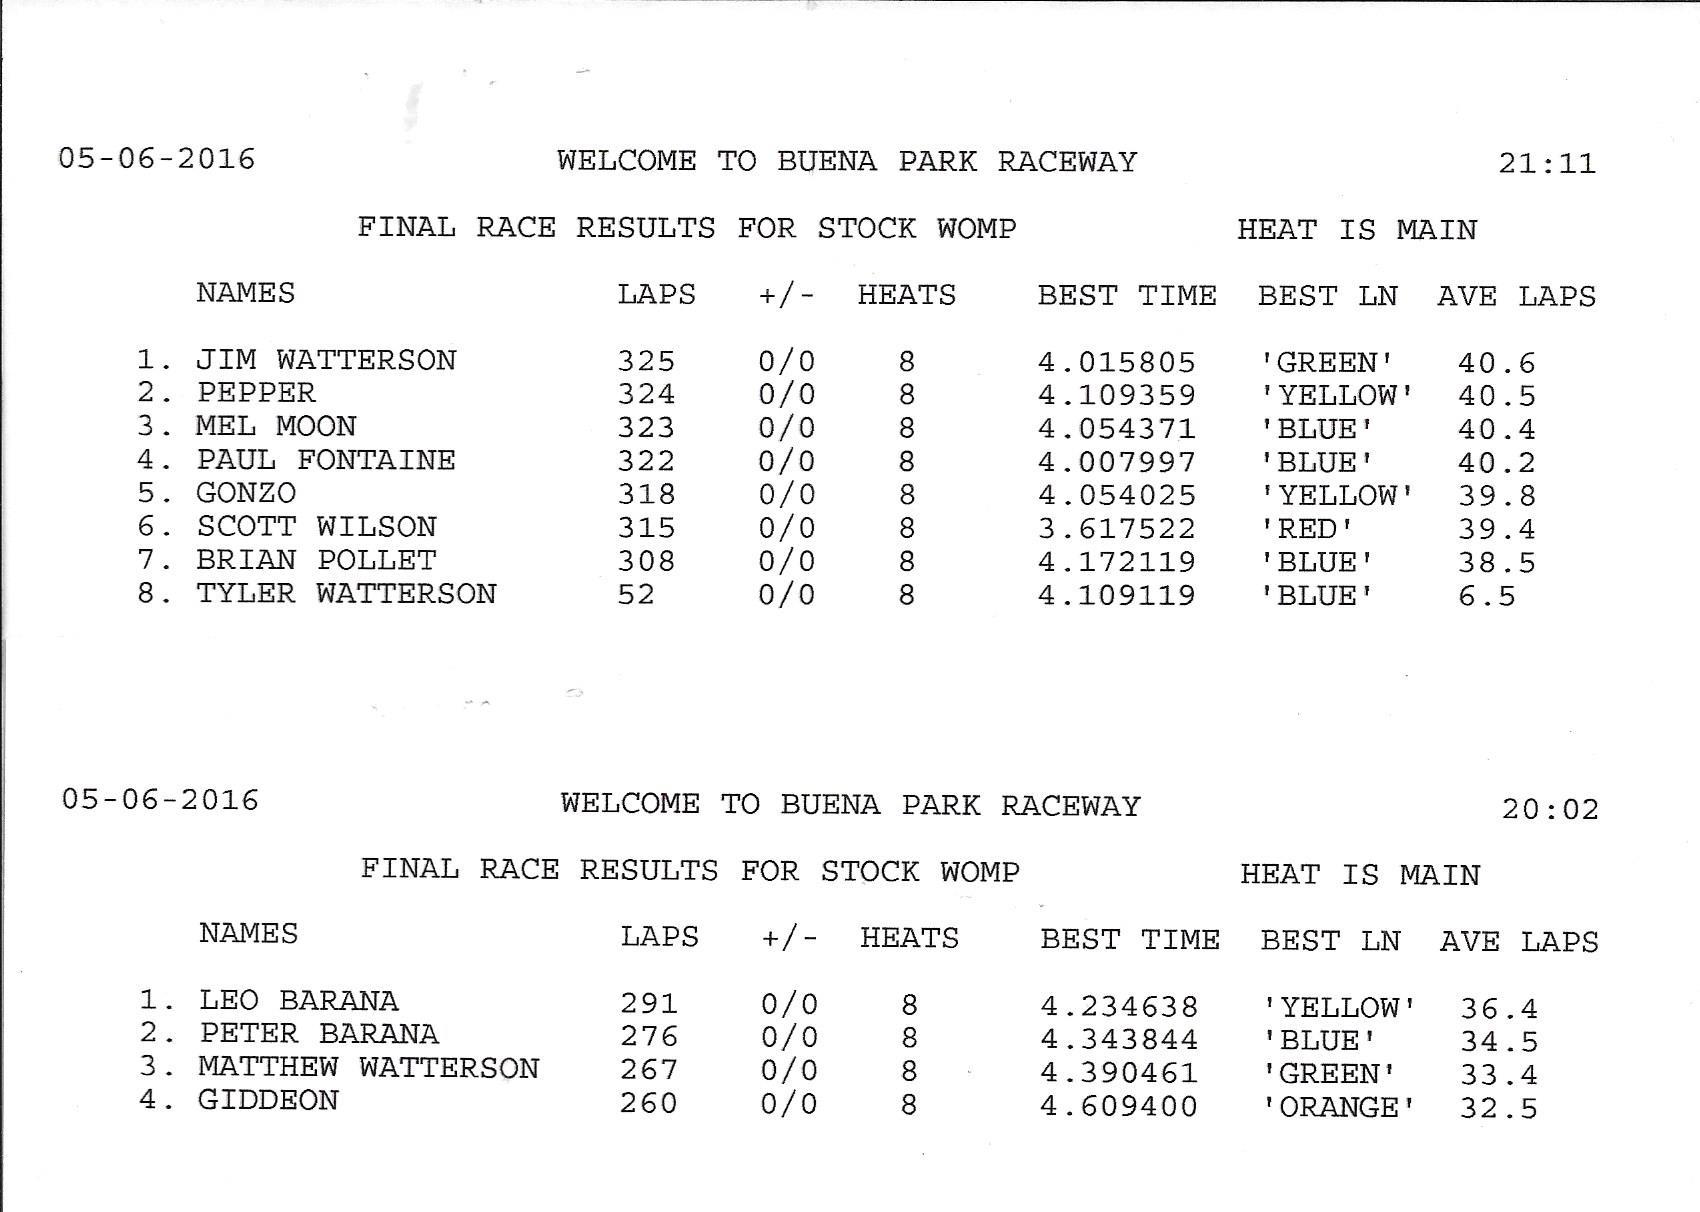 5616 results womp.jpg